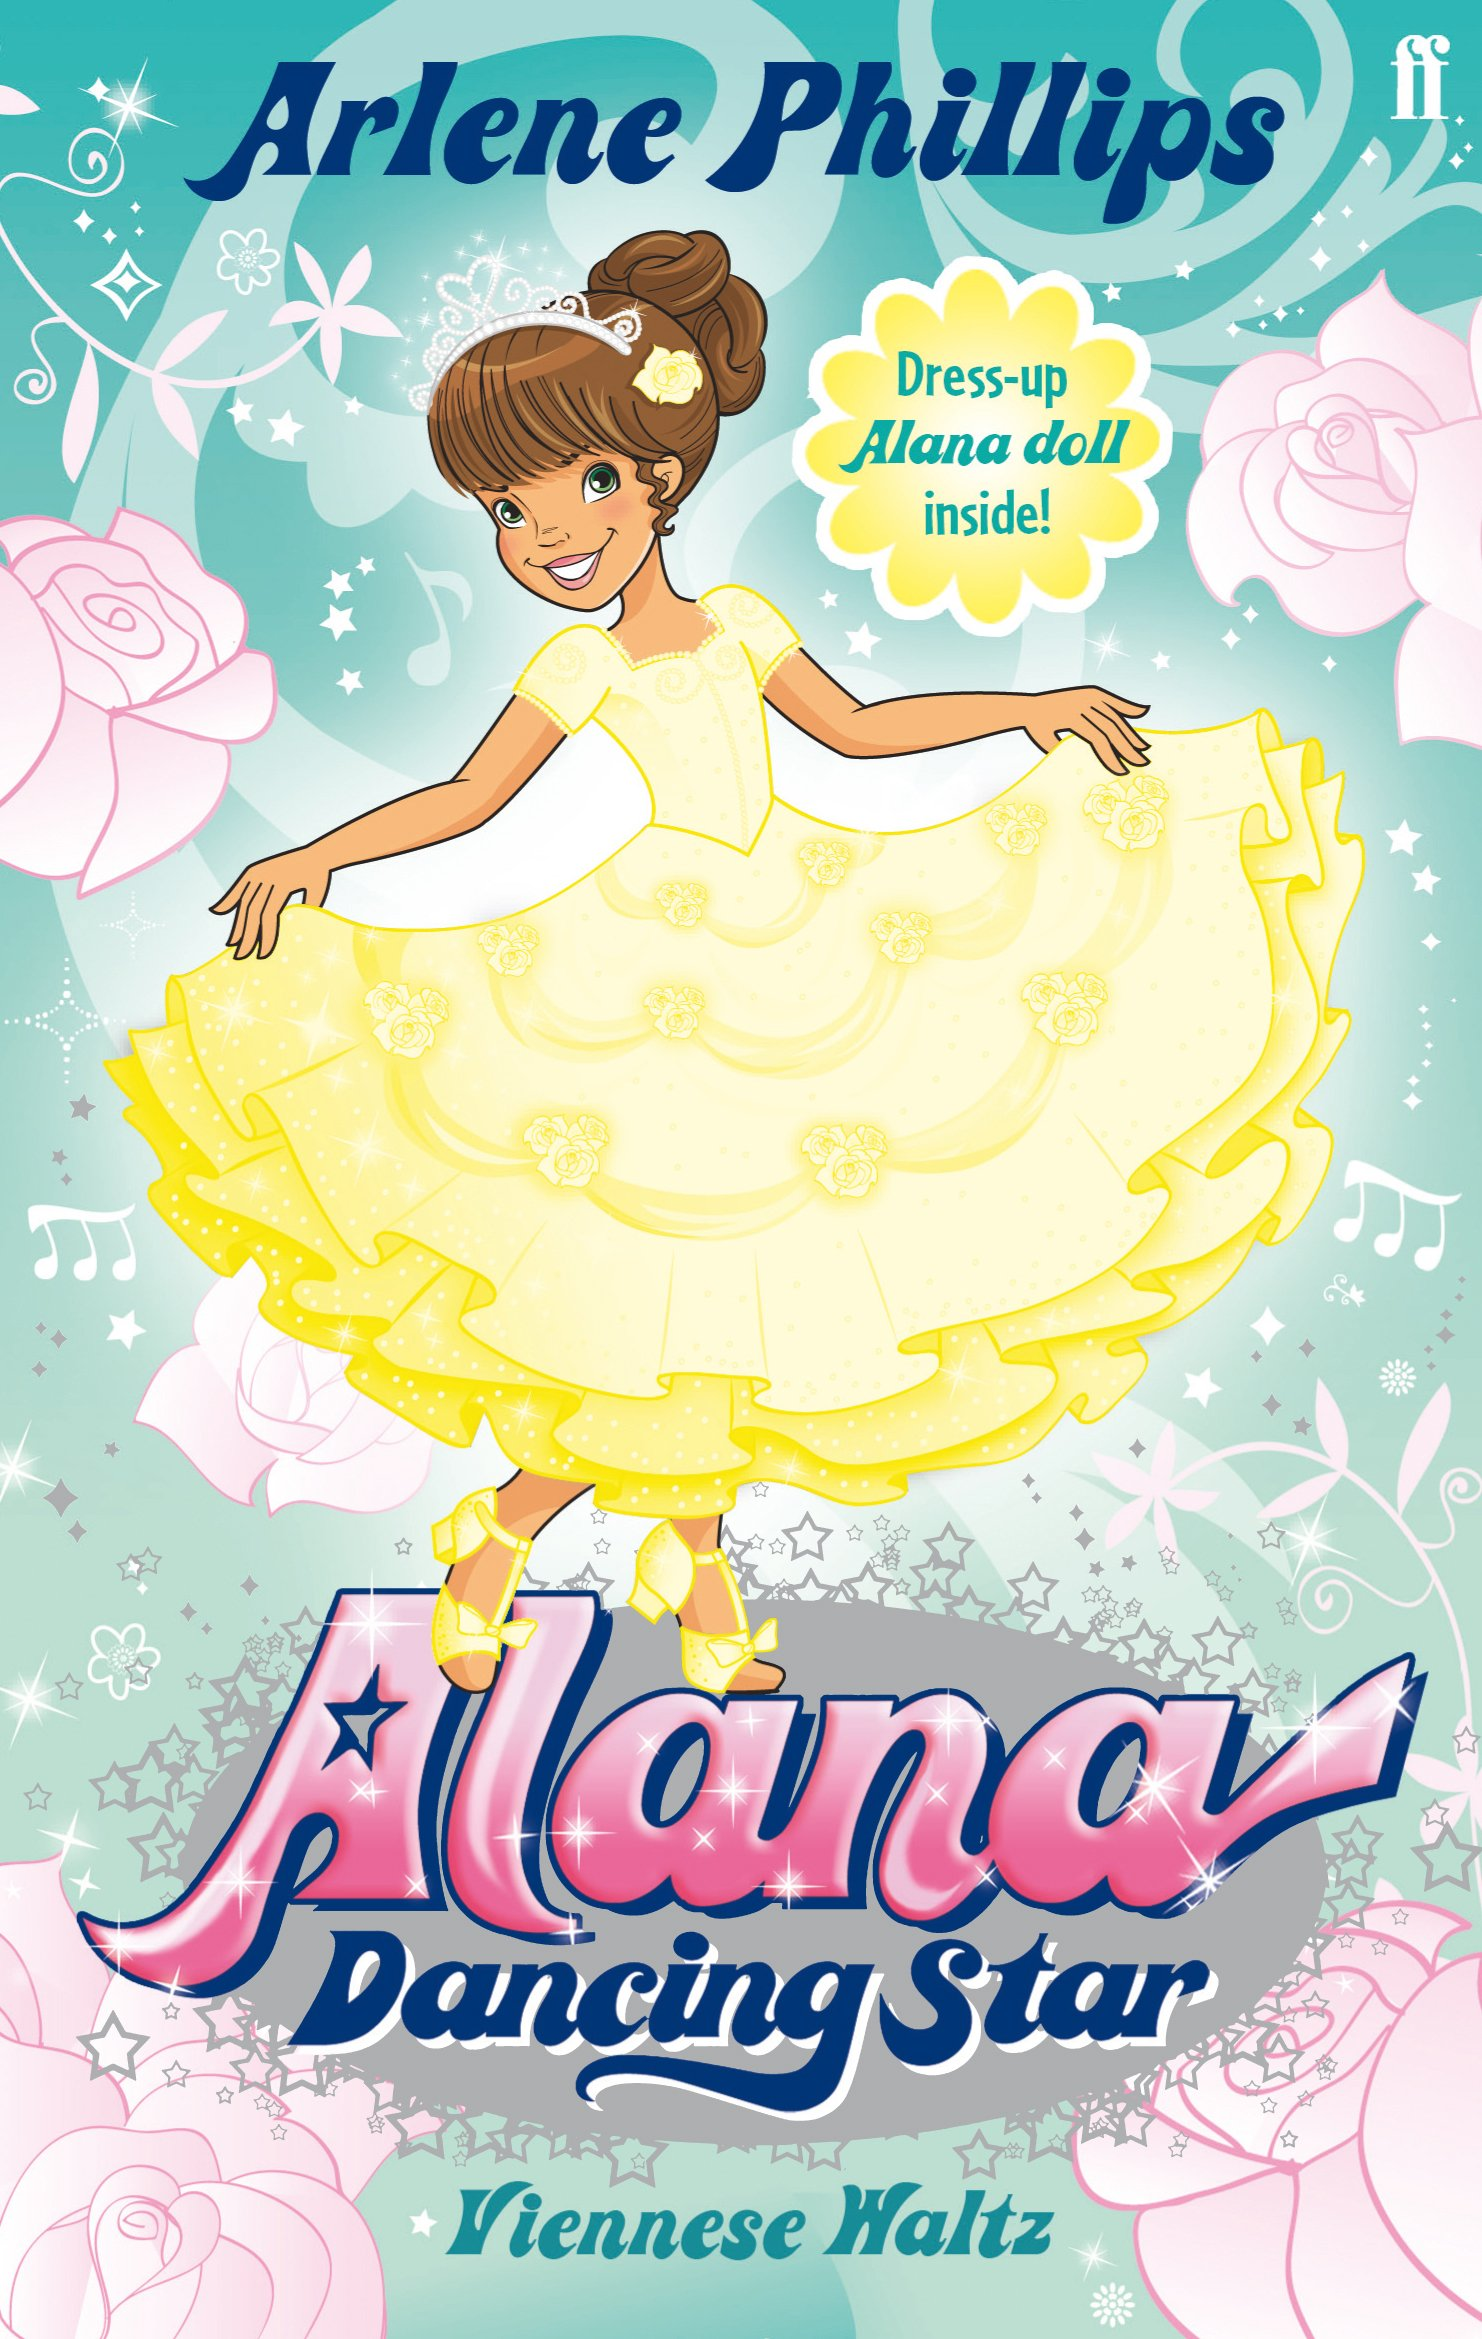 alana dancing star samba spectacular phillips arlene potts pixie